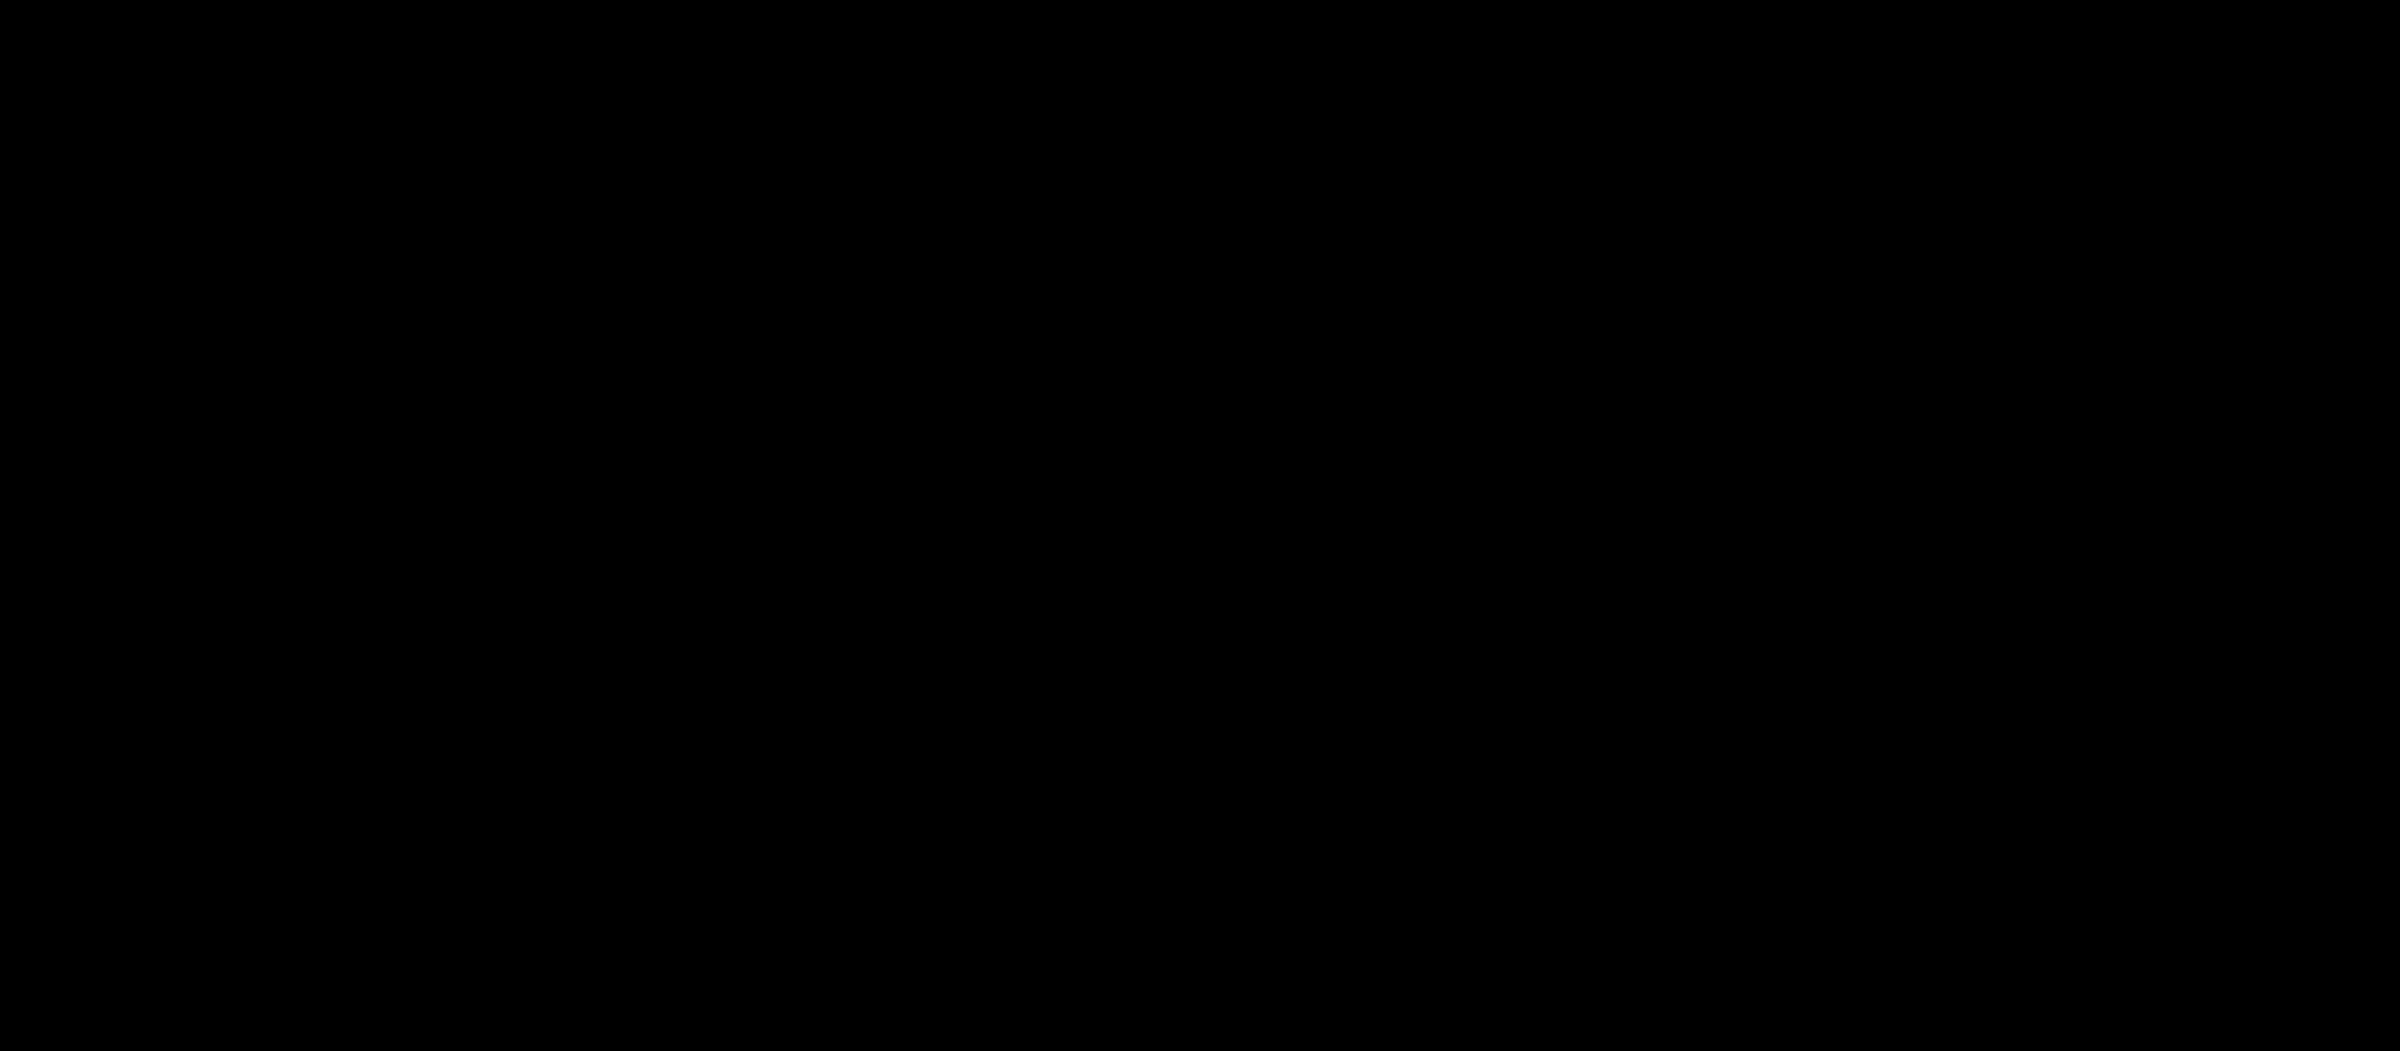 Clipart Handwritten Trademark Symbol